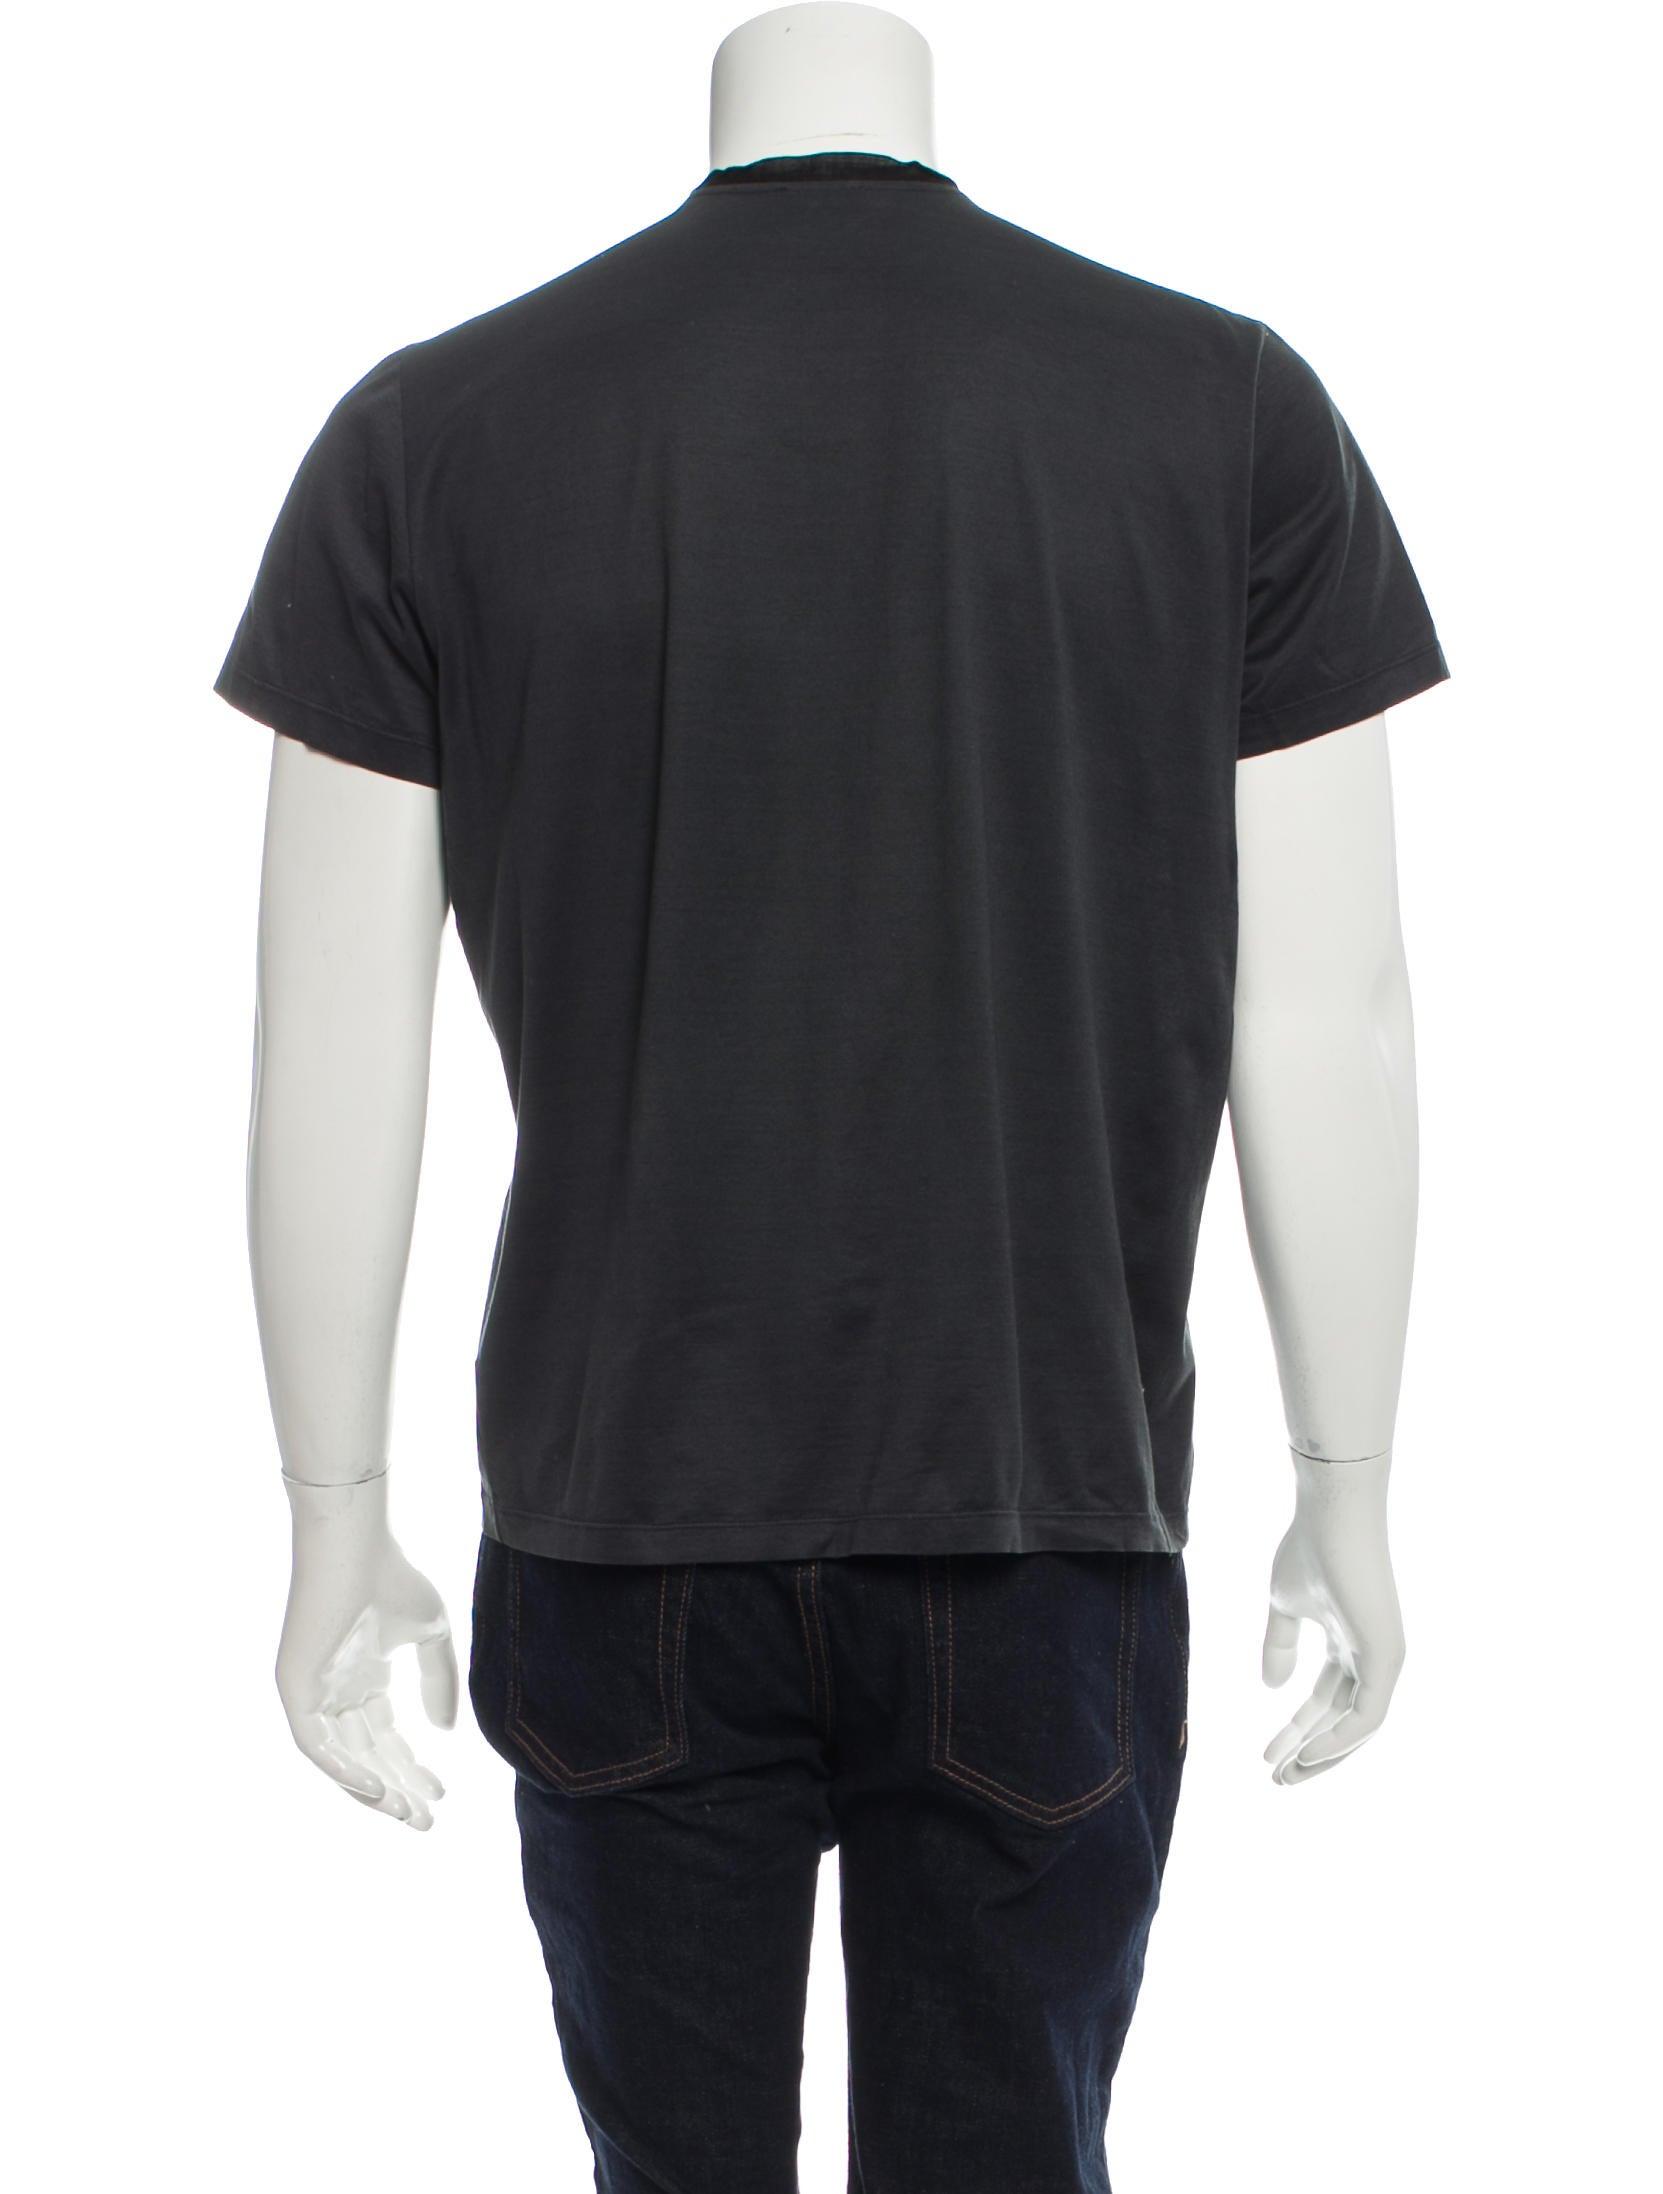 lanvin short sleeve henley t shirt clothing lan61236